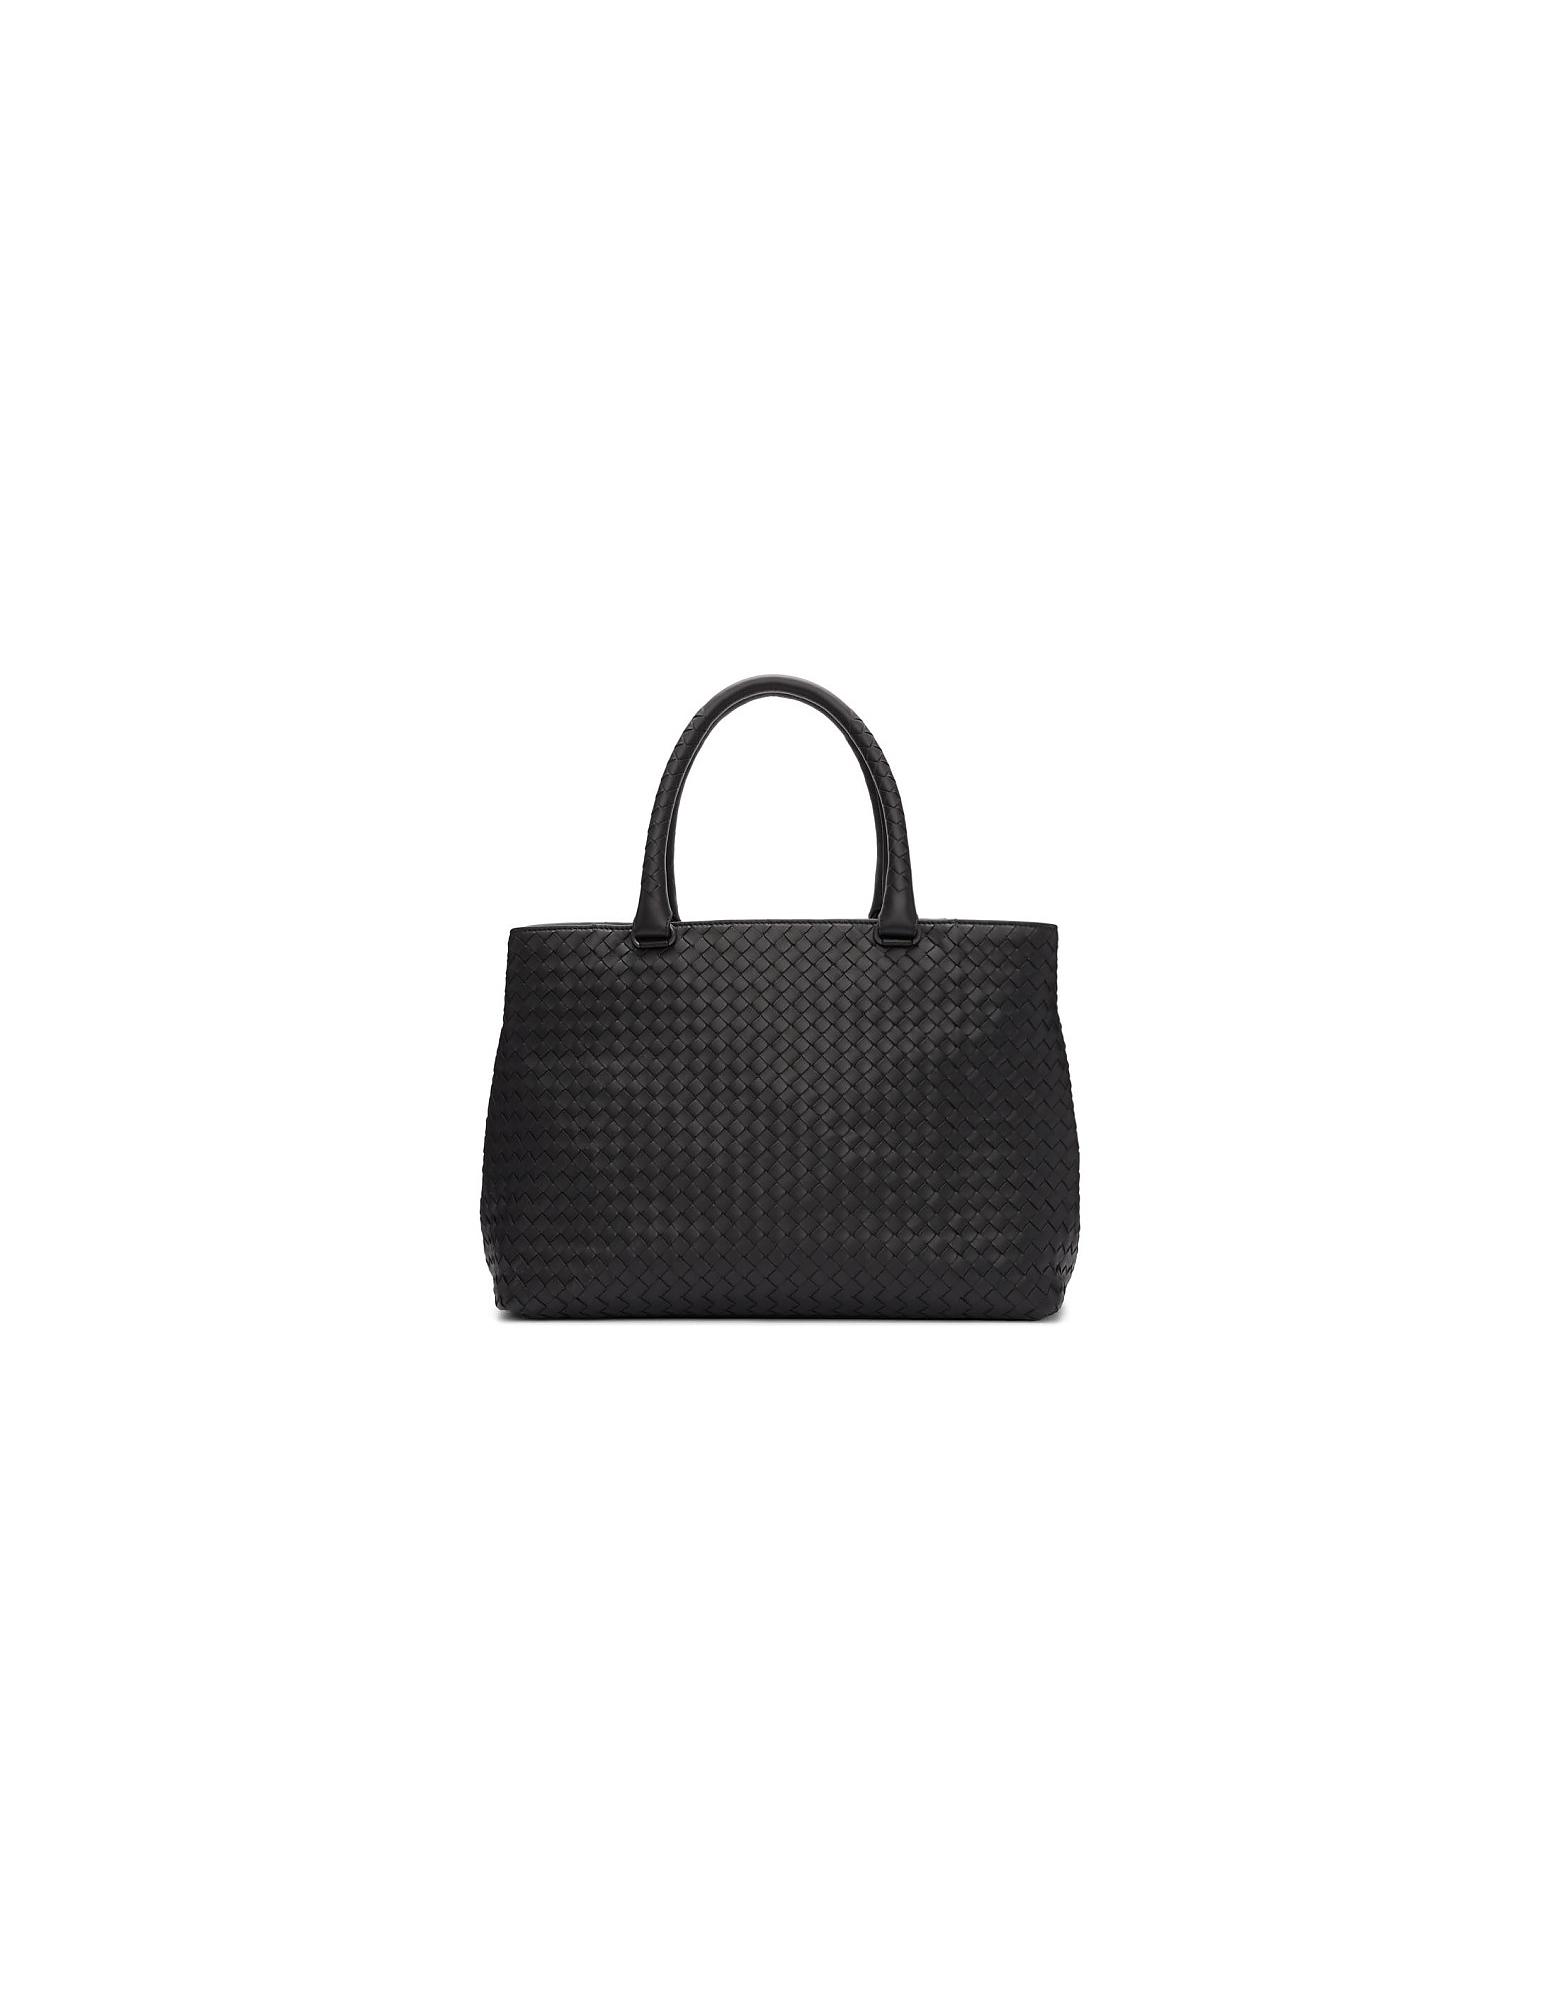 Bottega Veneta Designer Handbags, Black Intrecciato Leather Tote